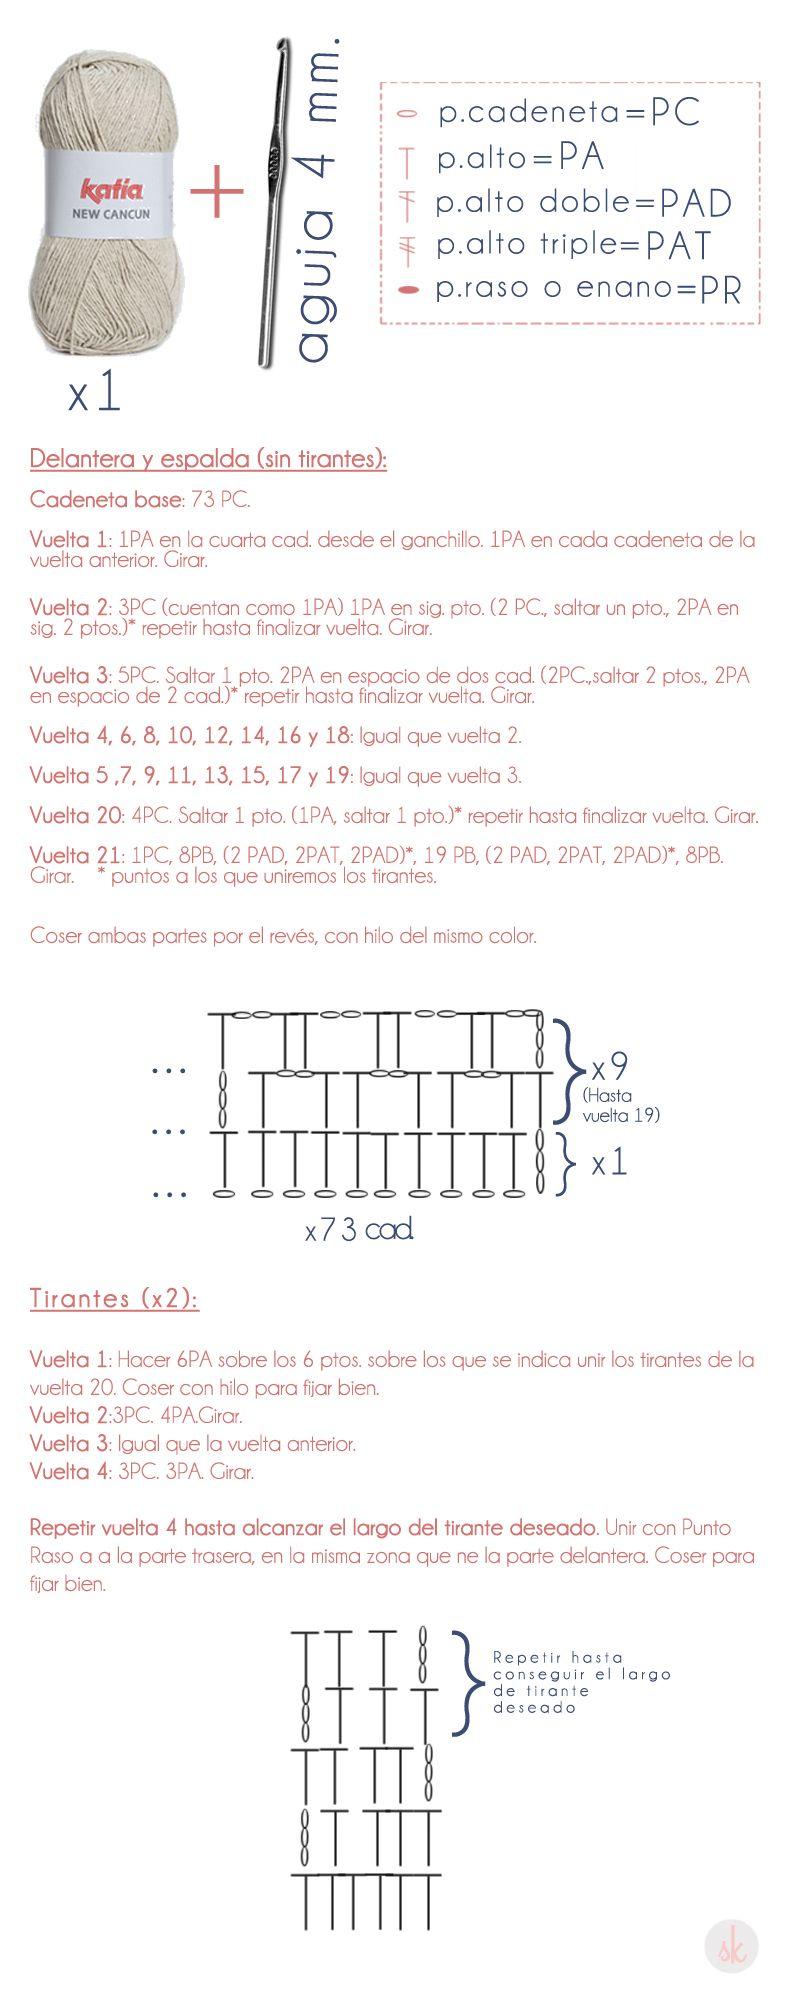 Patrón de CROP TOP hecho a ganchillo (crochet) | Crochet | Pinterest ...